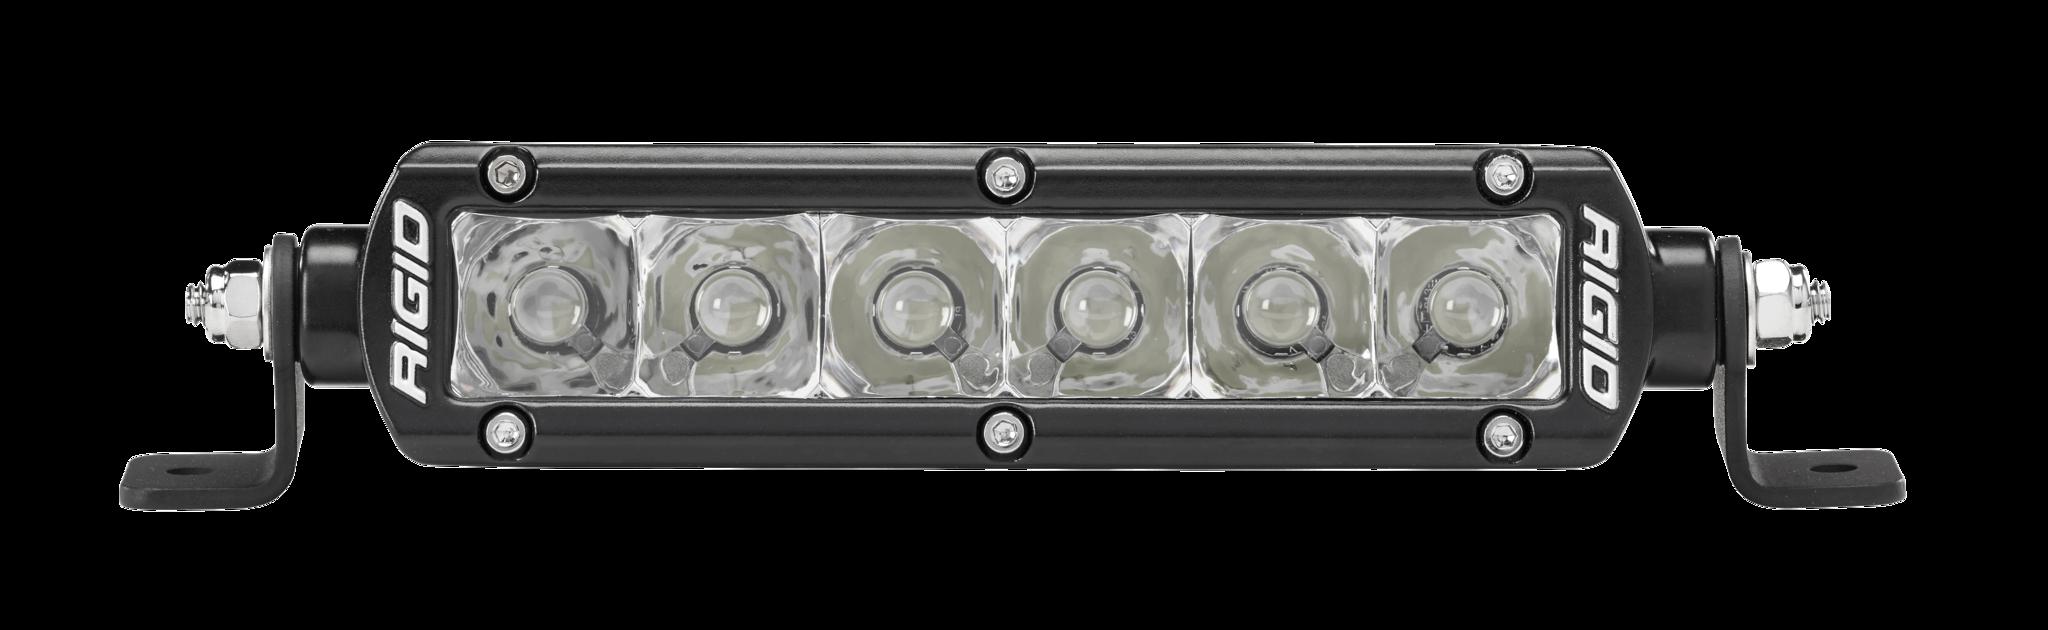 Rigid 6 lighting solutions and led light bars backwoods adventure mods the sr series pro led light bars provide a sleek aloadofball Choice Image